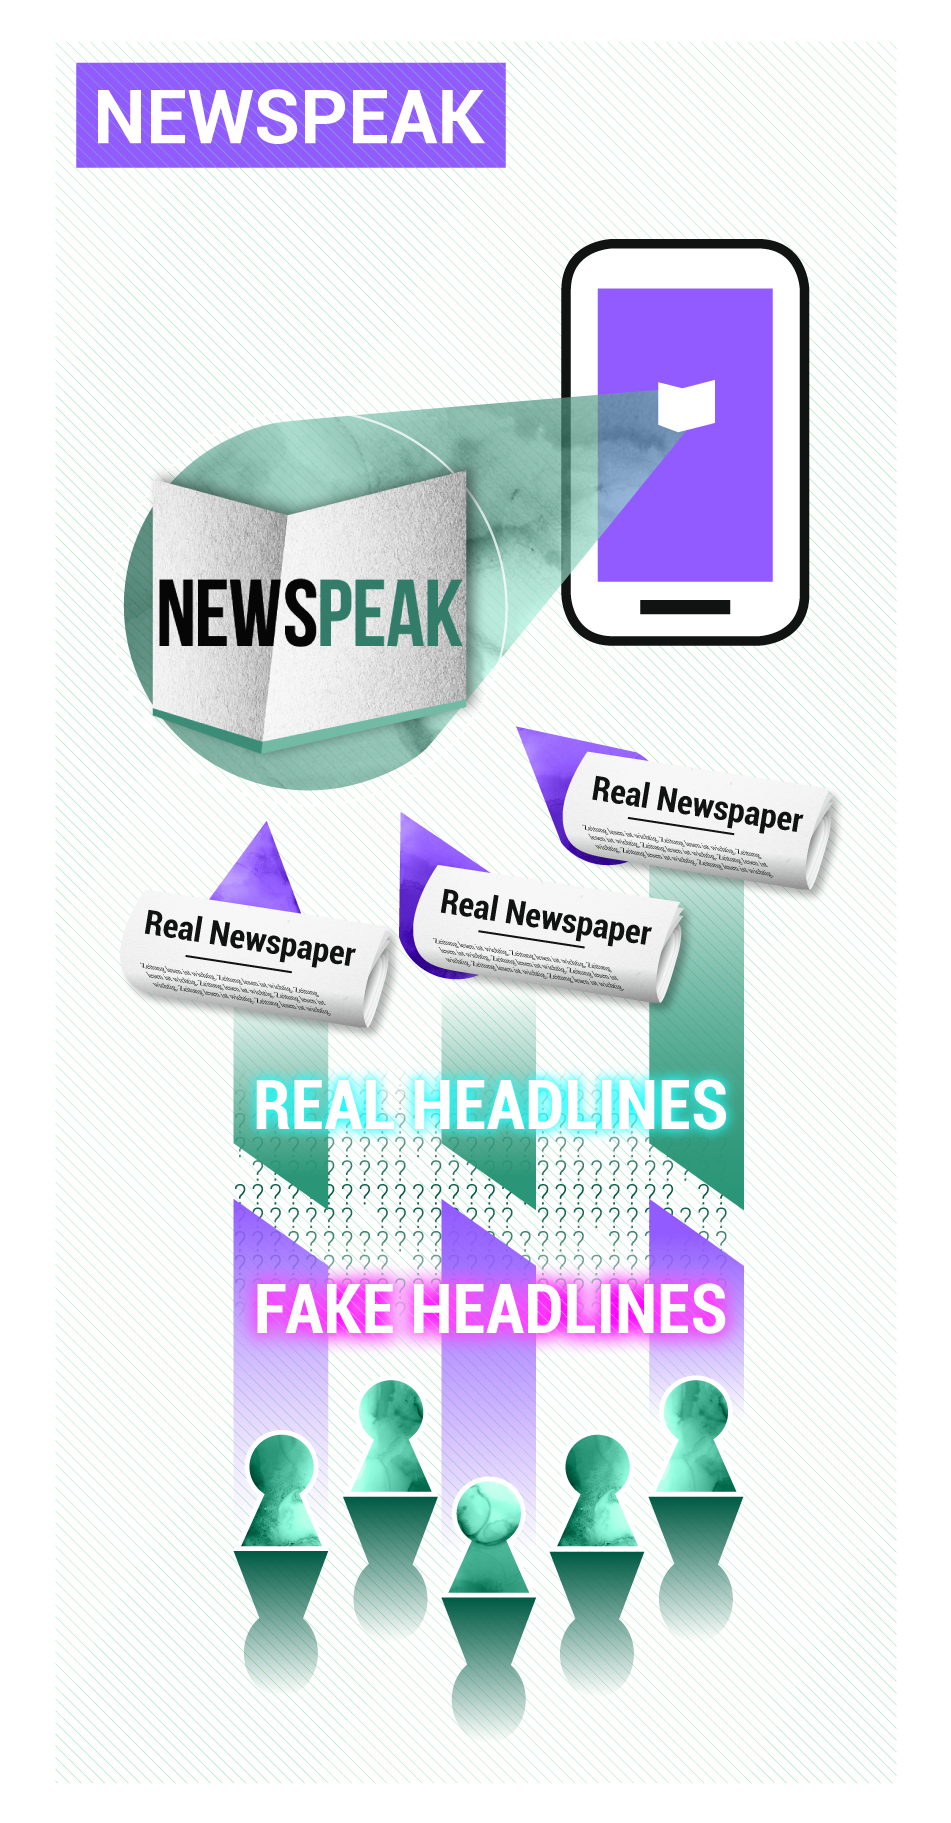 newspeak introbild